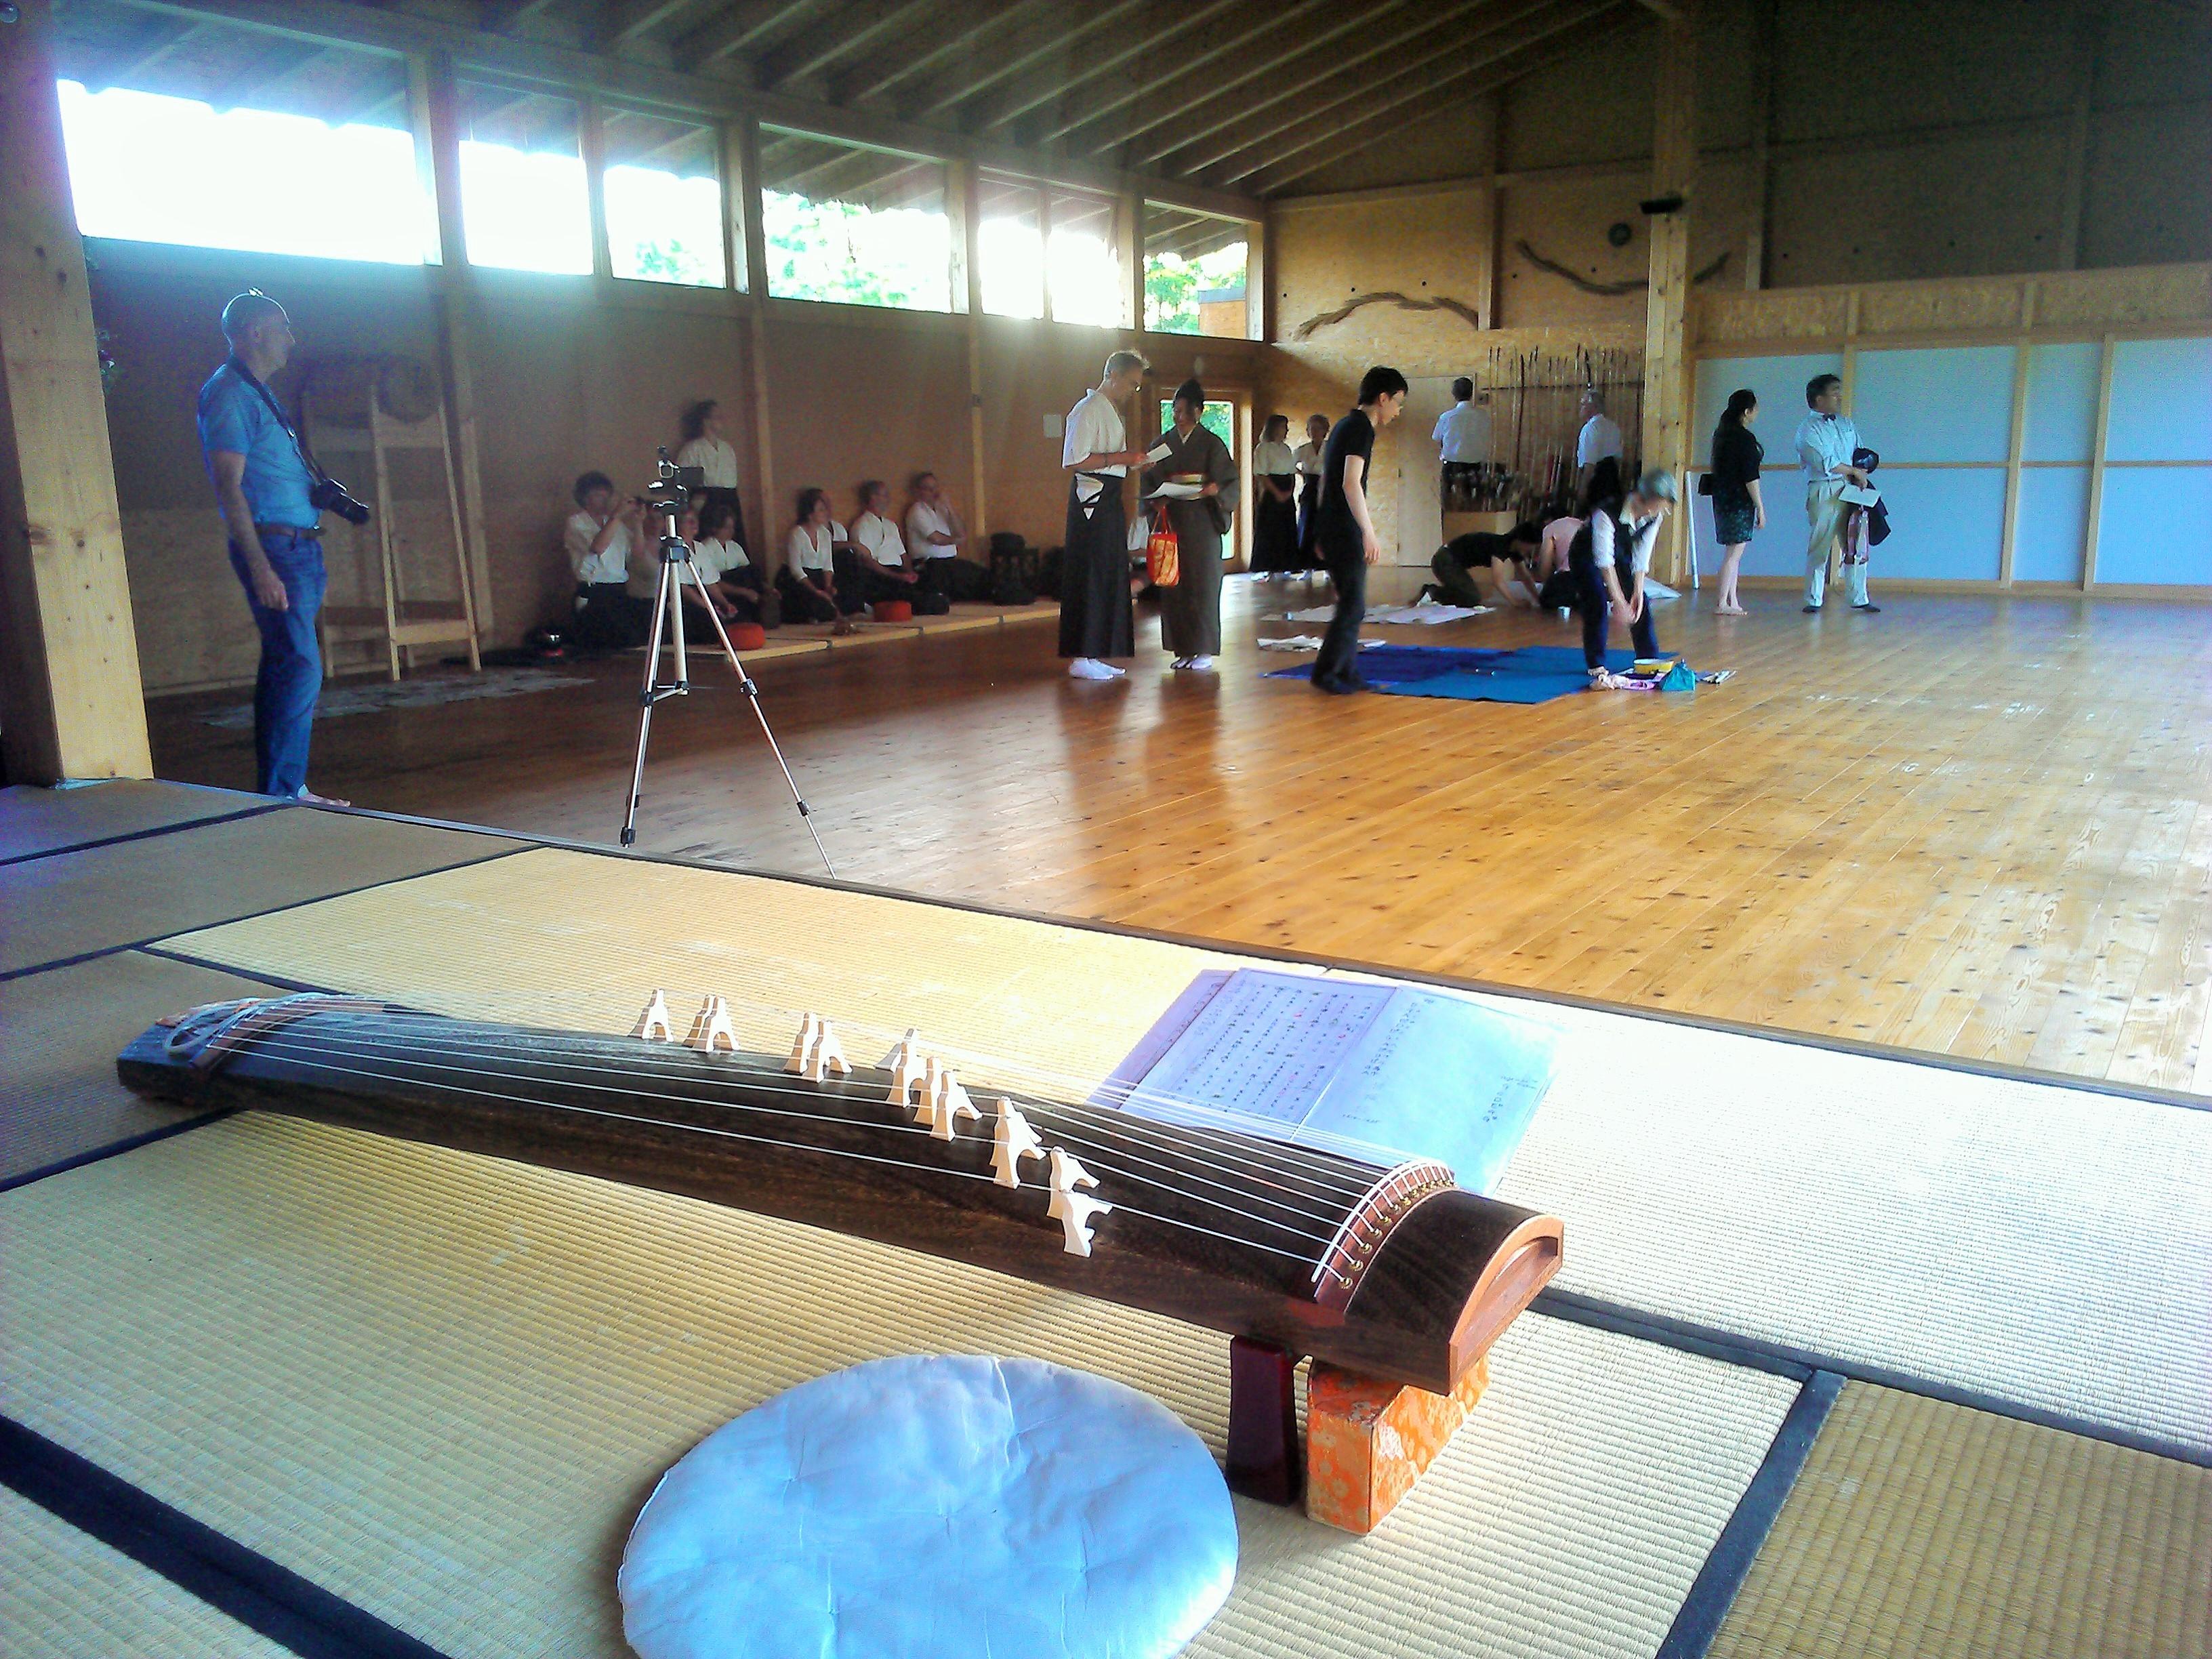 04.06.2015, Seminar Shibata XXI, japanischer Abend, WP_001309